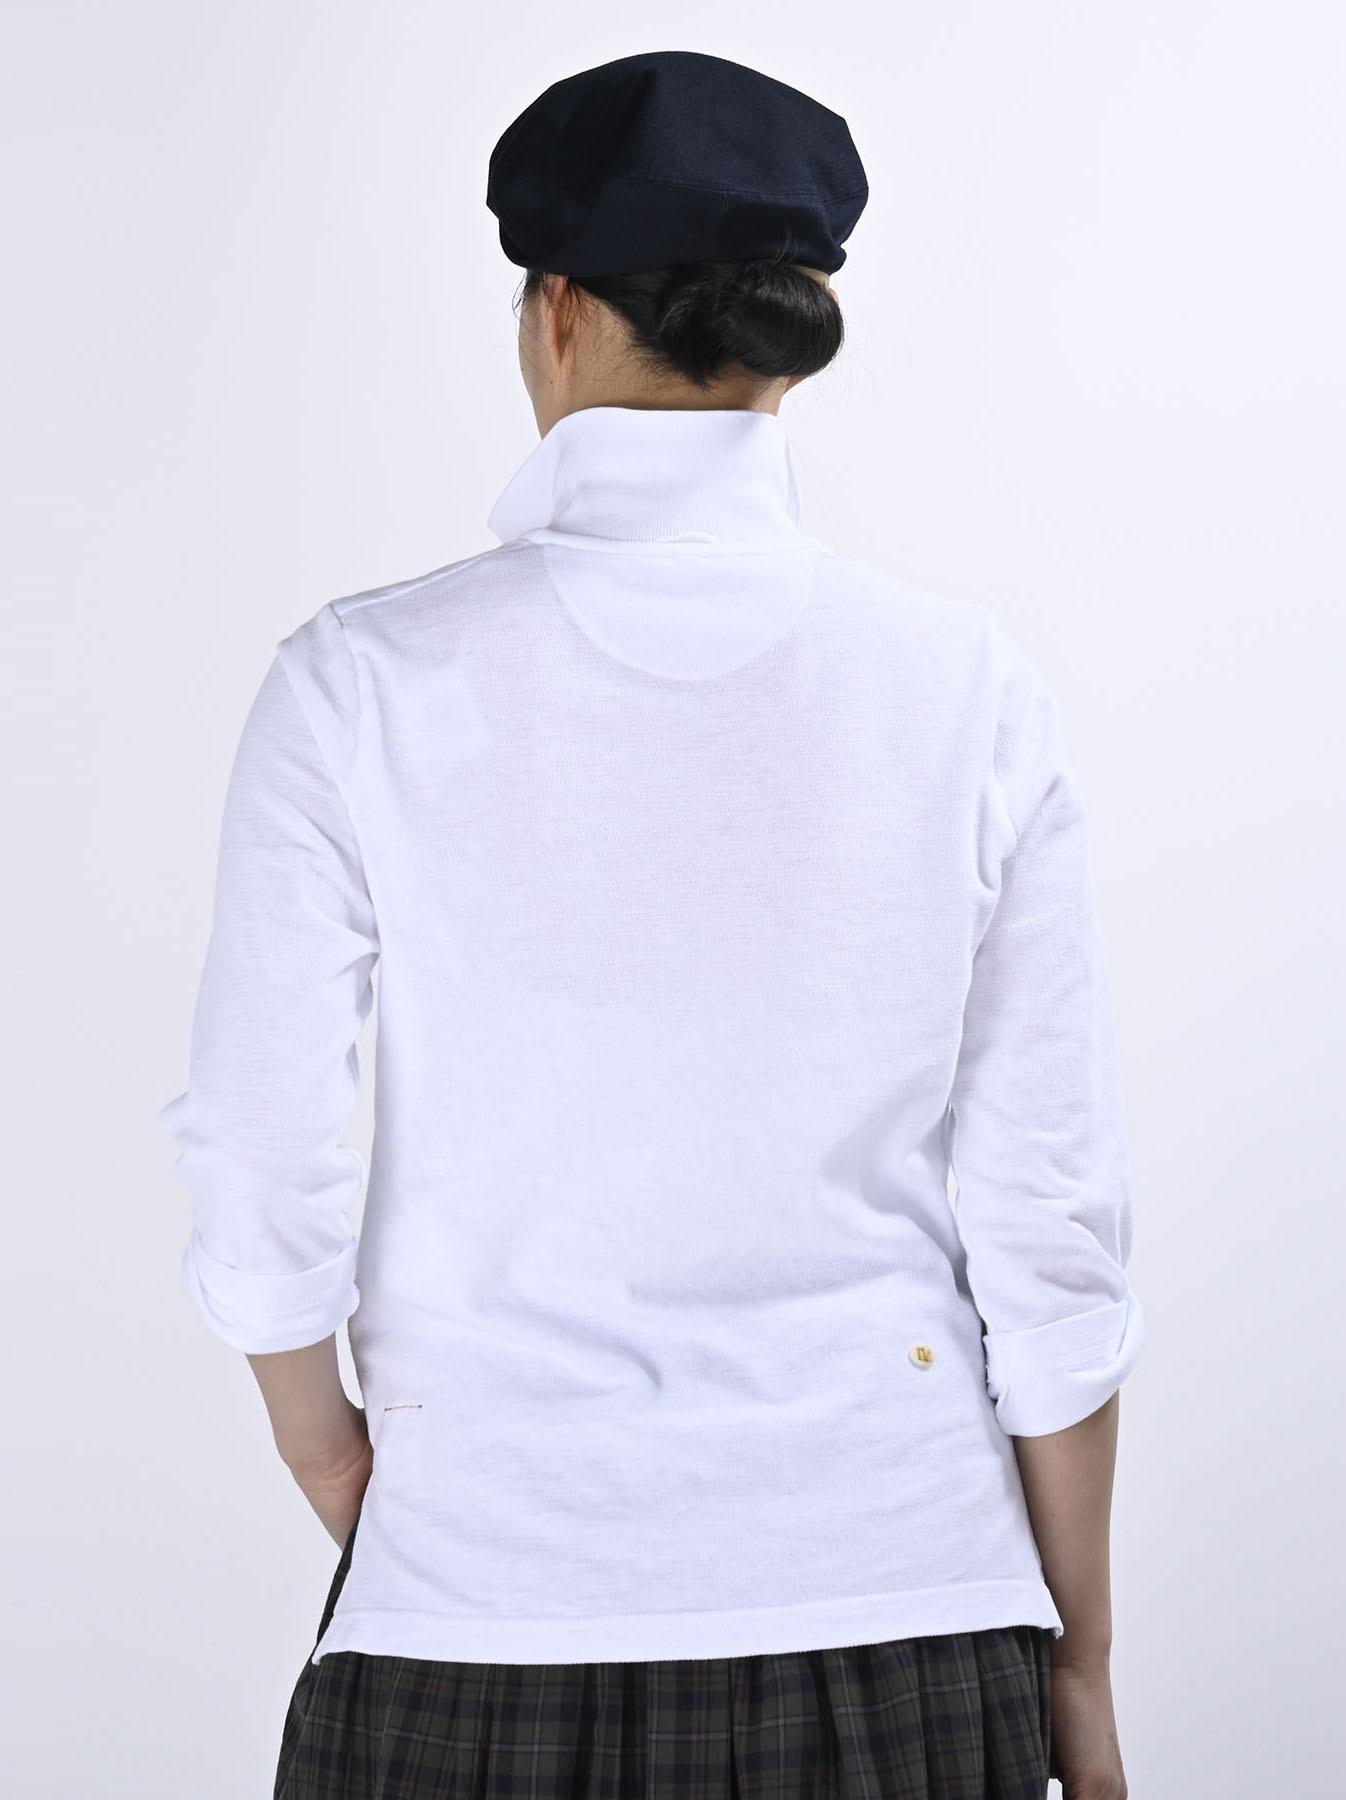 Kanoko Shiokaze Long-sleeved Square Polo Shirt (0521)-5